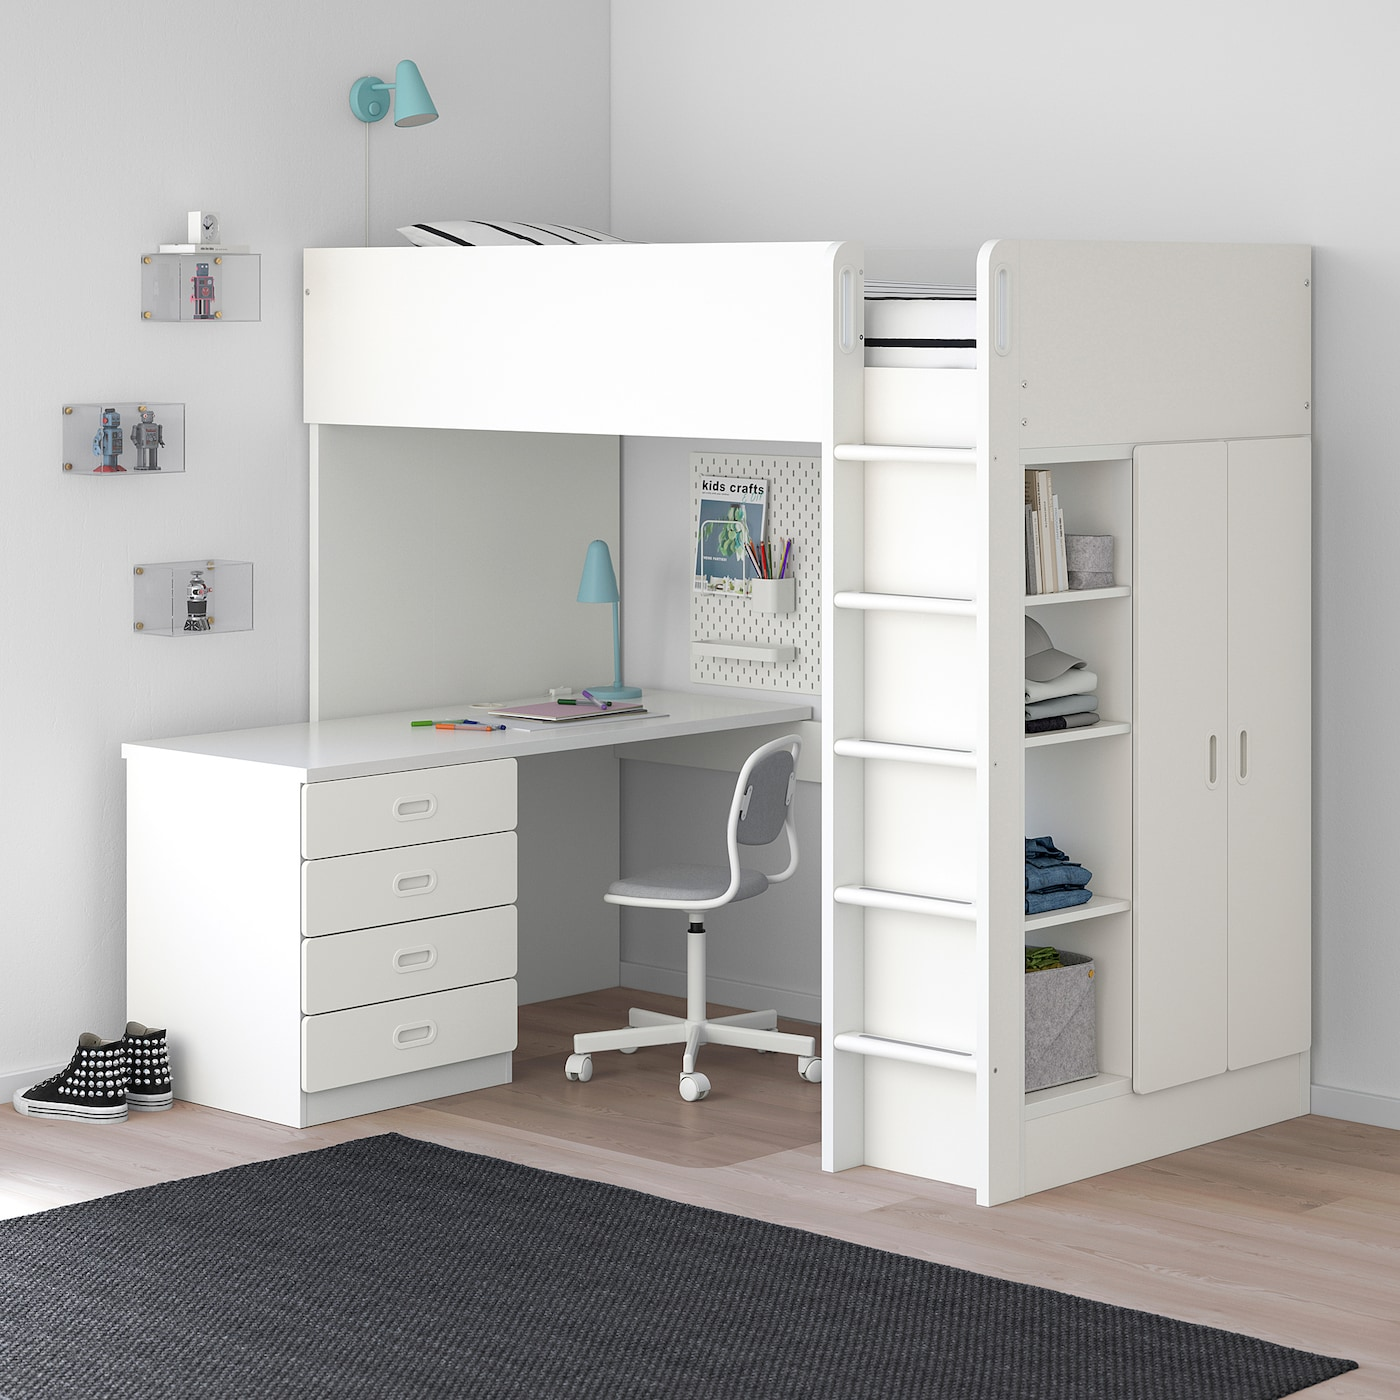 Chambre Garcon 2 Ans Ikea stuva / fritids combi lit mezz+4 tir/2 ptes - blanc, blanc 207x99x182 cm